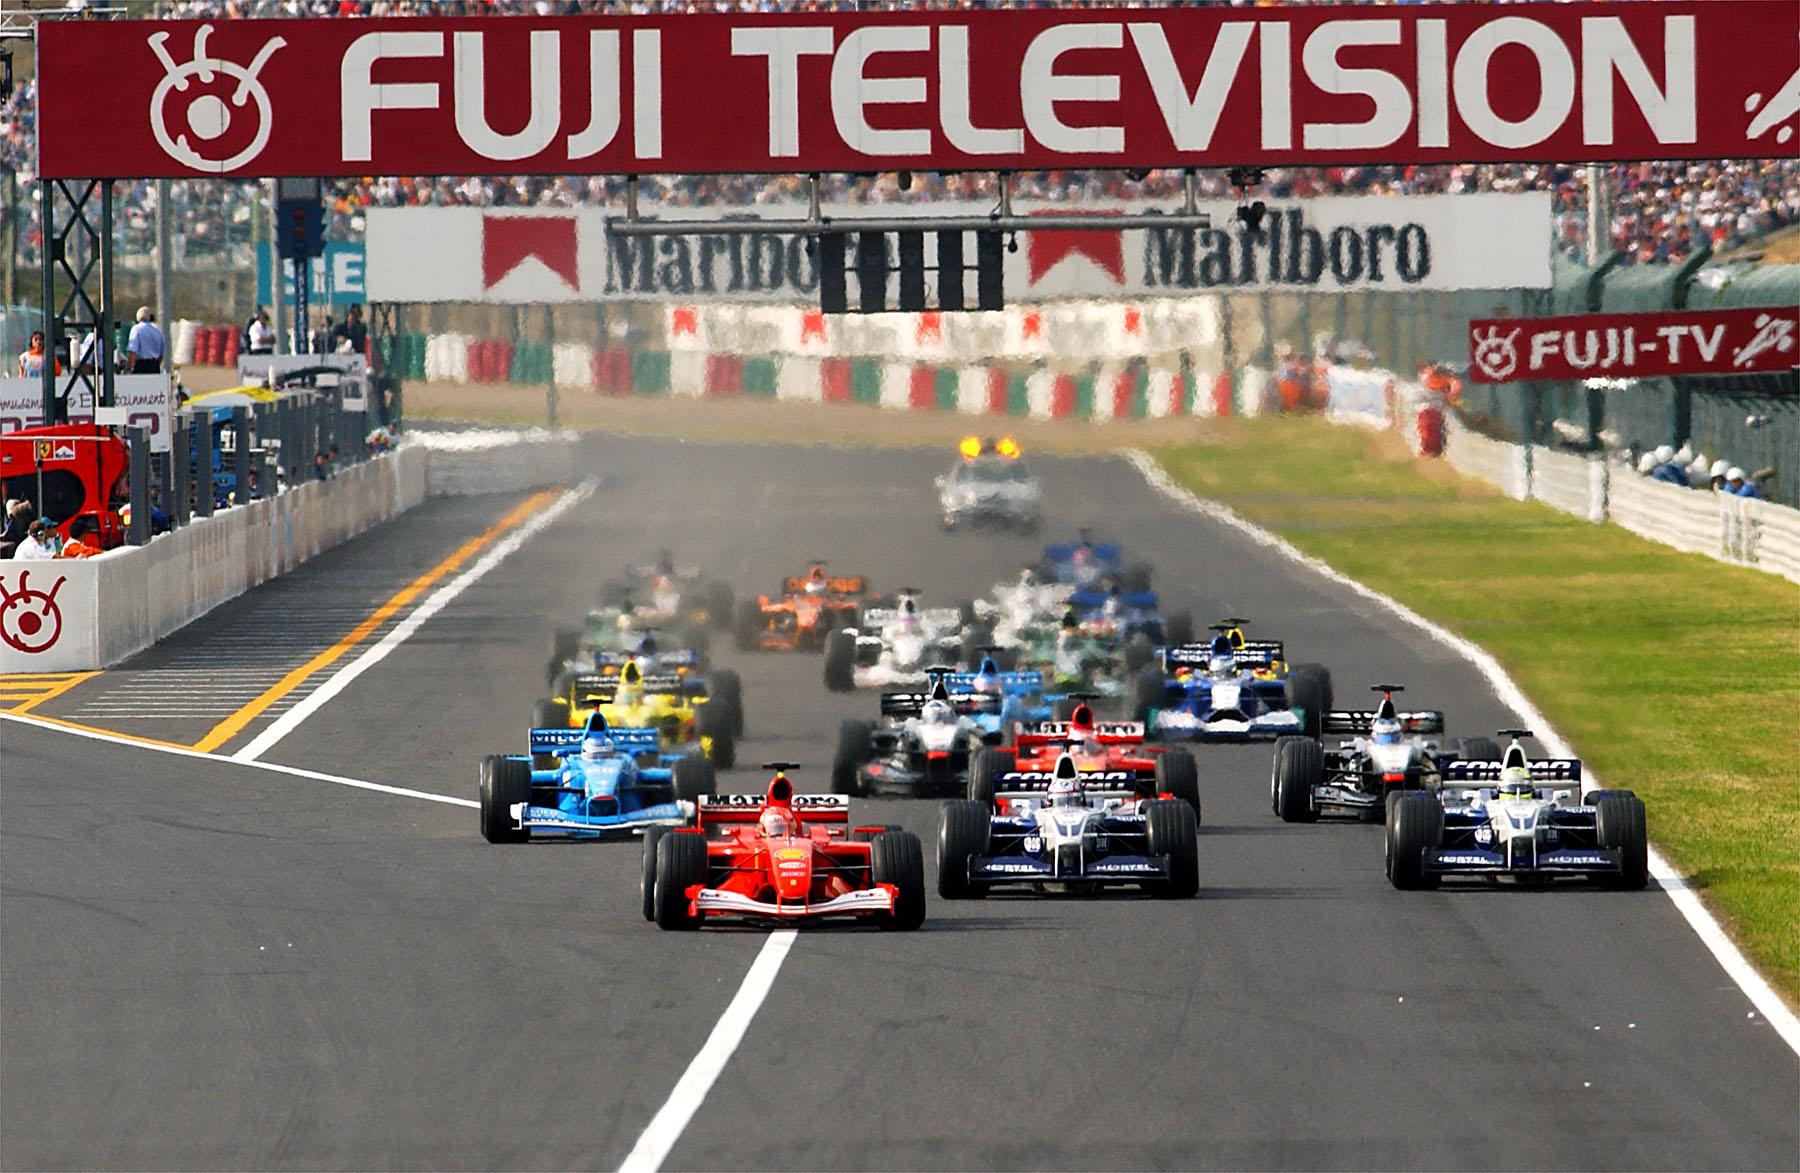 2001 Japanese GP Start Photo Ferrari